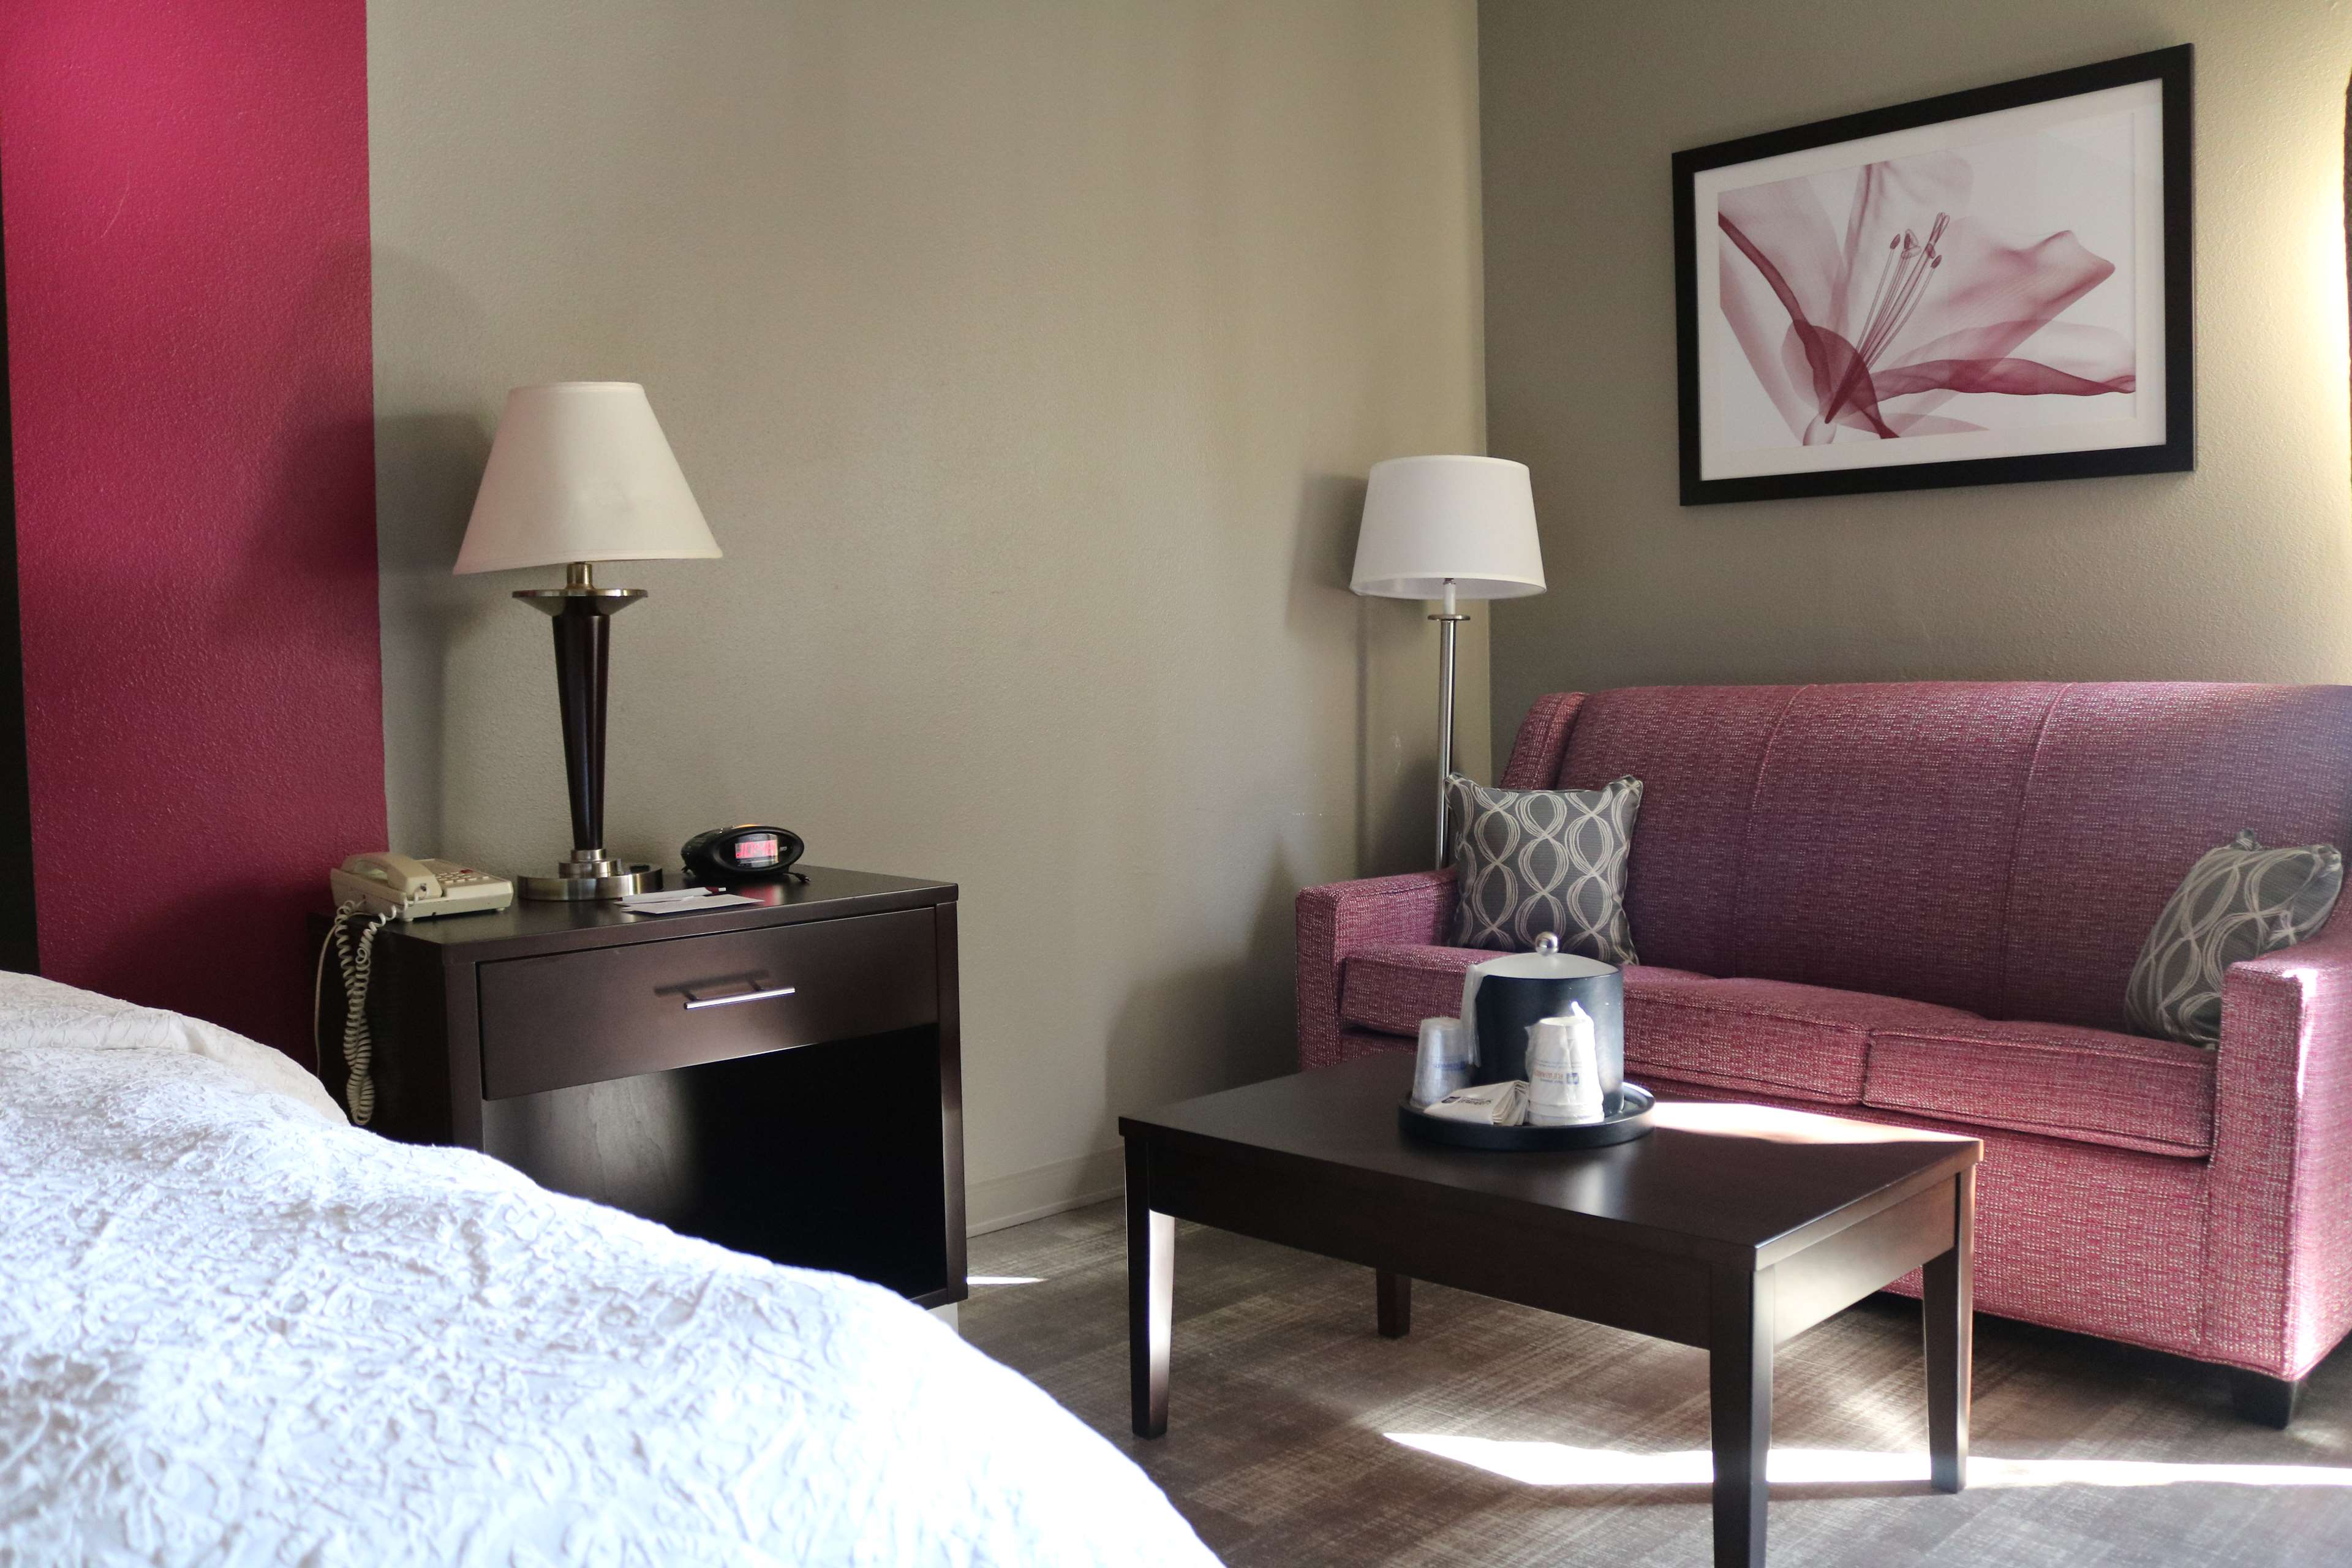 Best Western Plus Greensboro Airport Hotel image 31